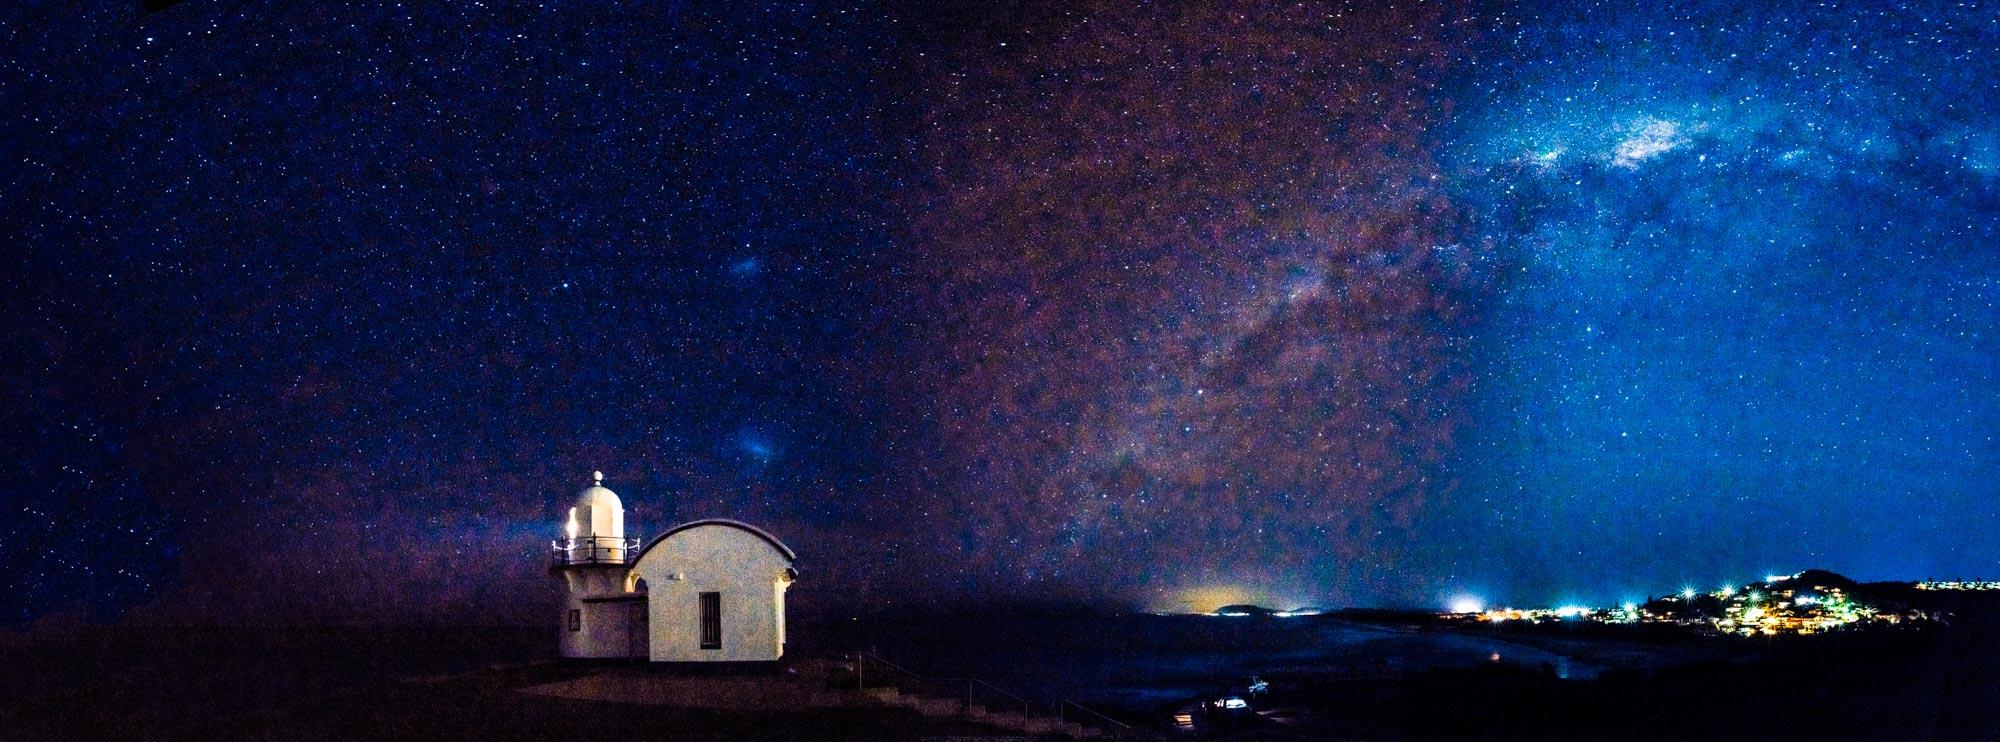 Tacking Point Lighthouse, beneath the Milky Way, NSW, Australia